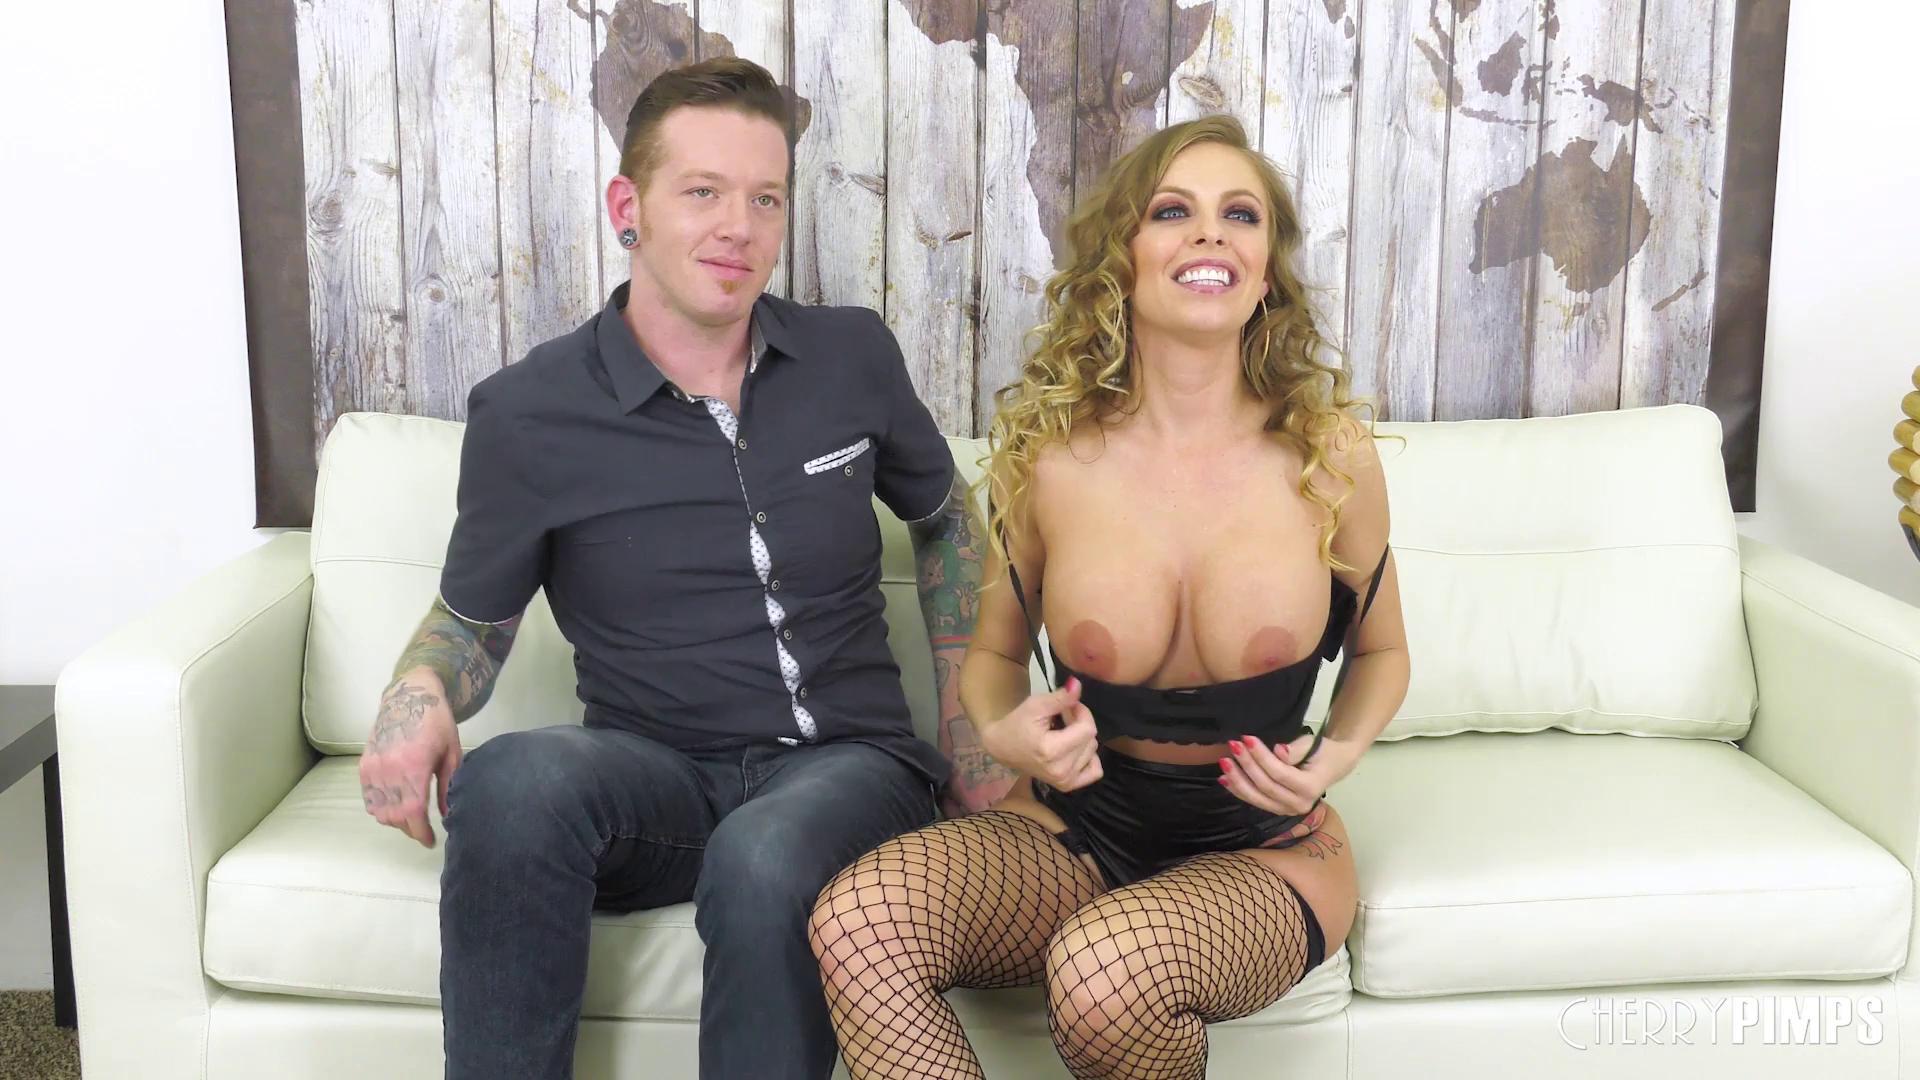 WildOnCam – Britney Amber